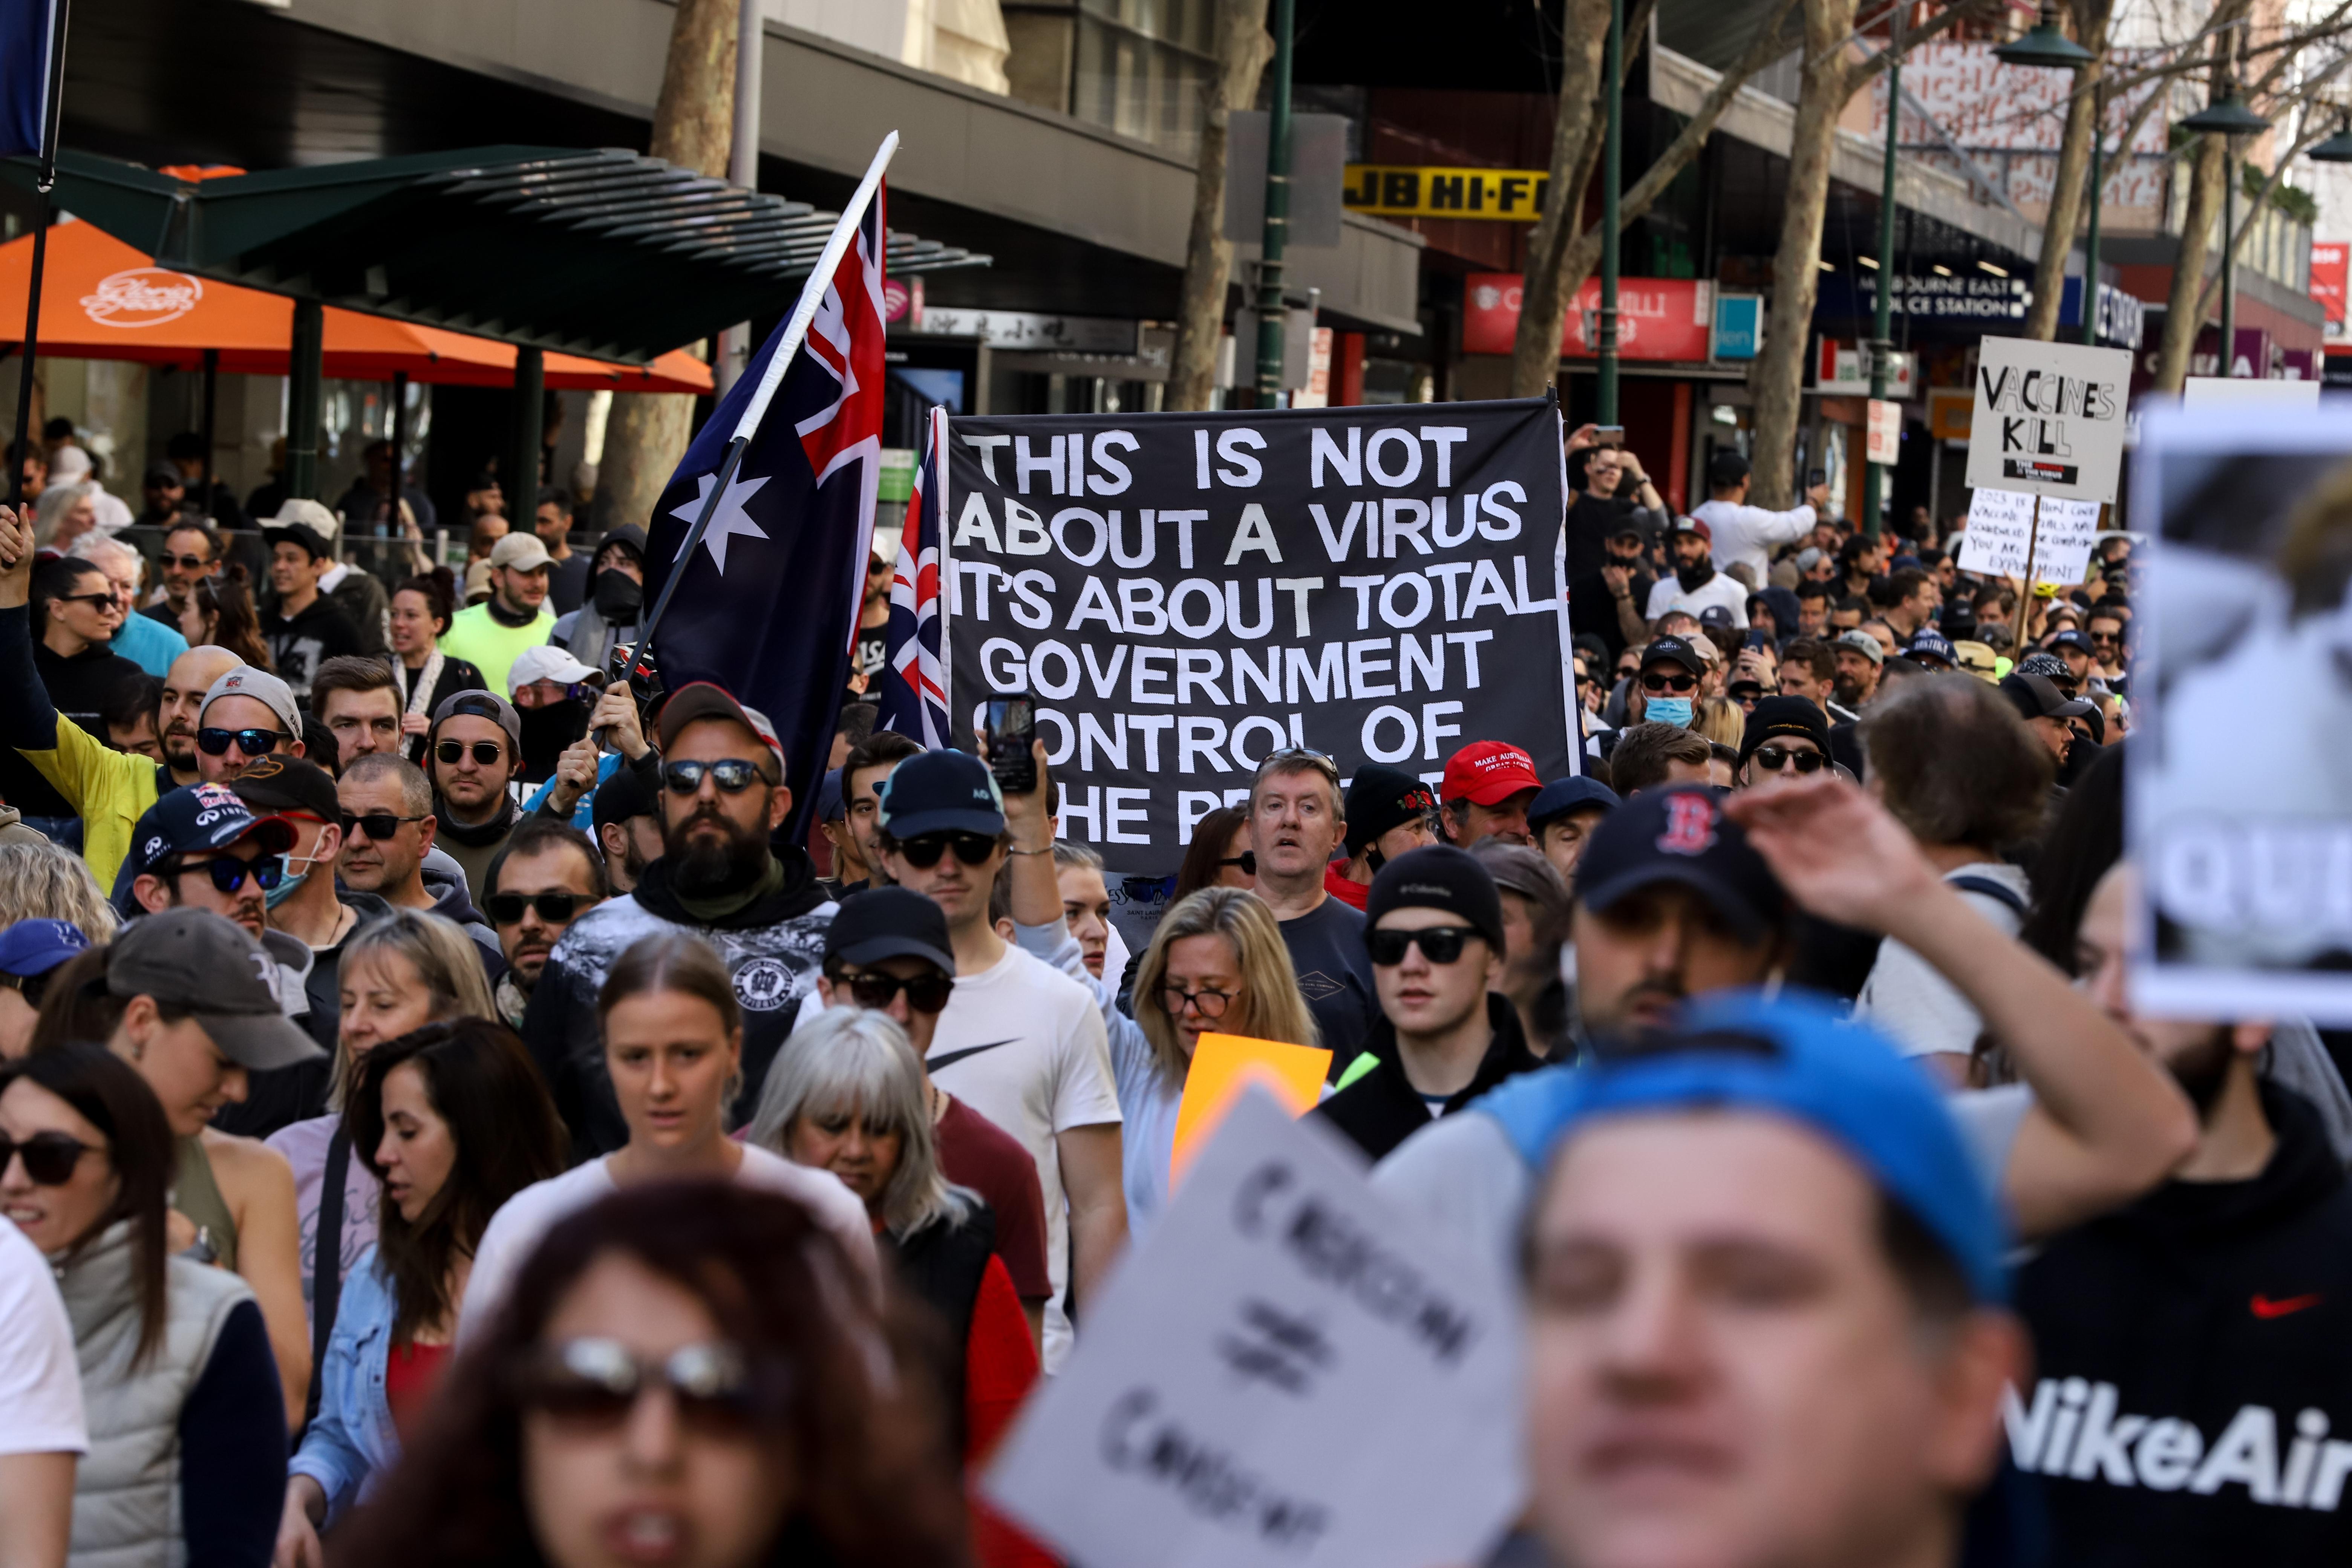 Melbourne anti-lockdown protests, Saturday August 21, 2021.